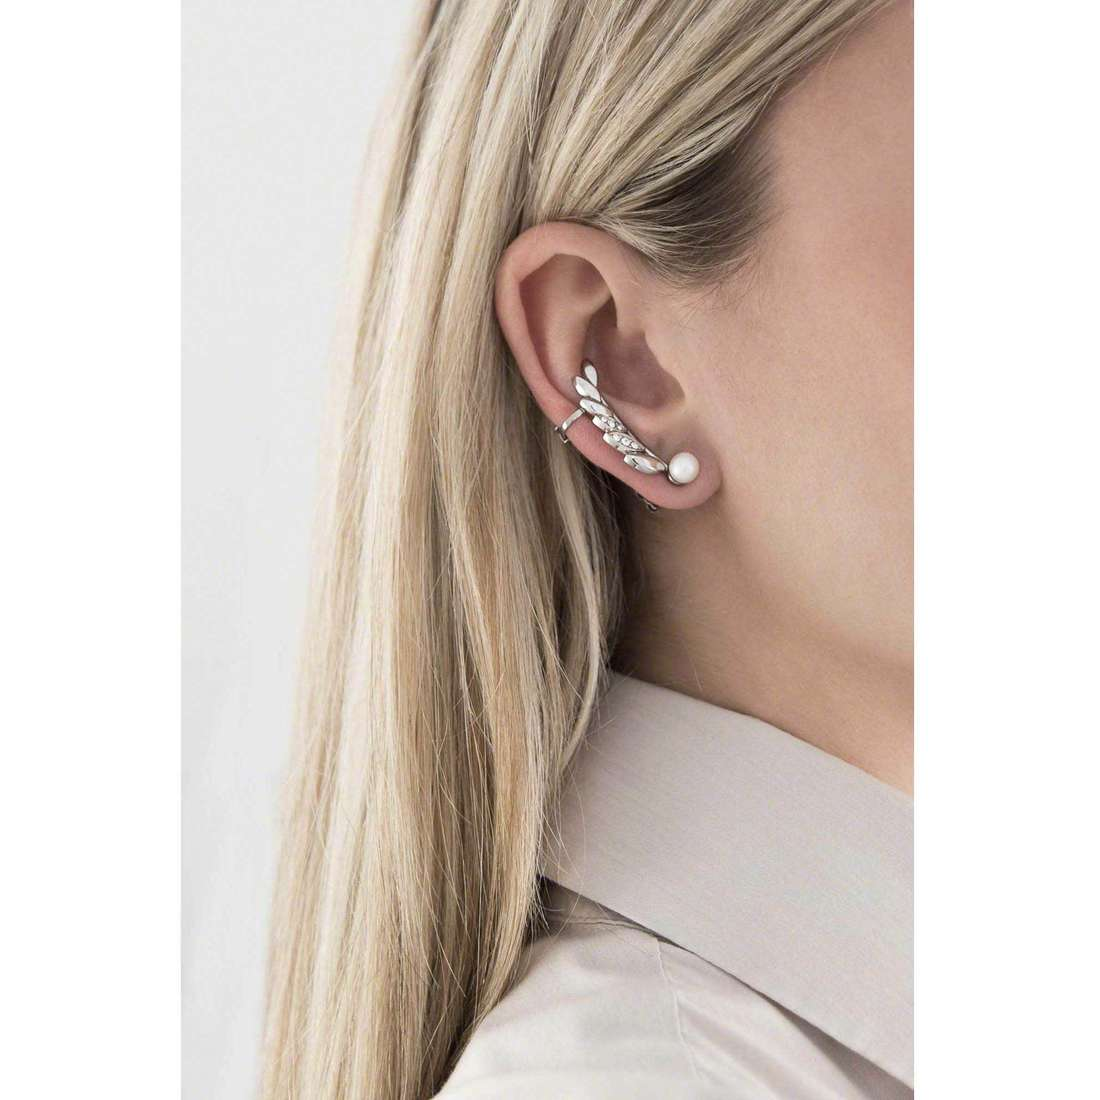 Morellato boucles d'oreille Gioia femme SAER22 indosso